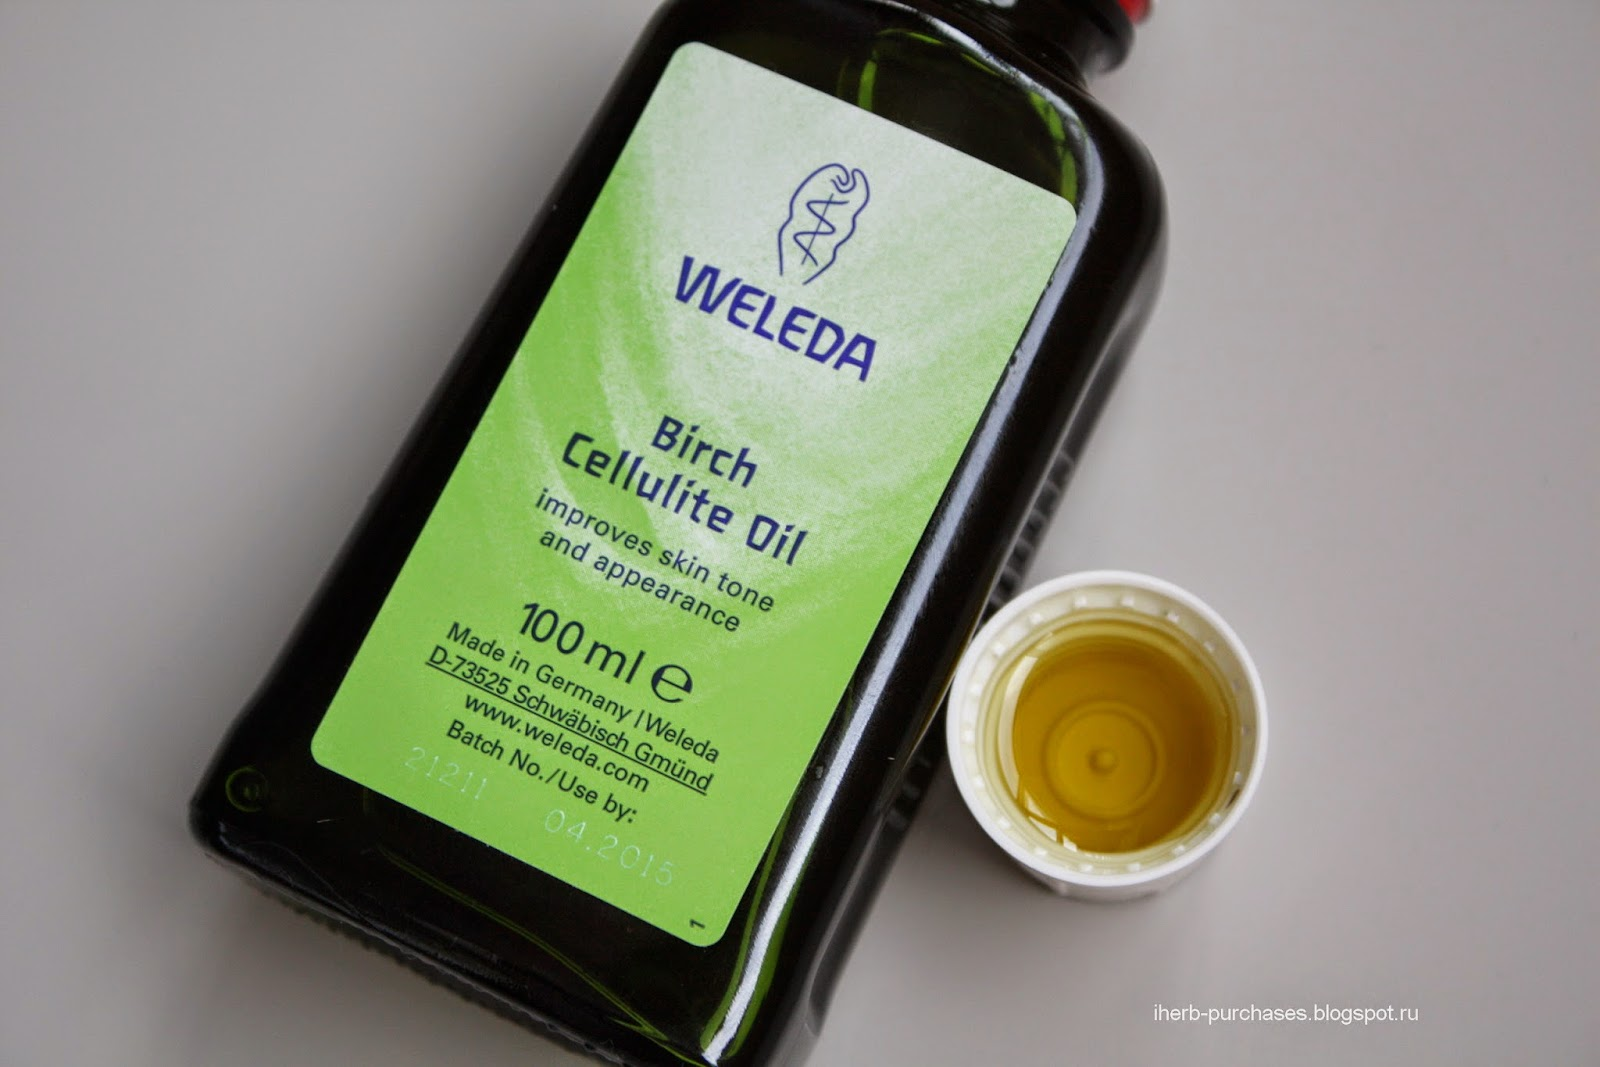 масло для тела, от целлюлита, антицеллюлитное, отзыв, iherb